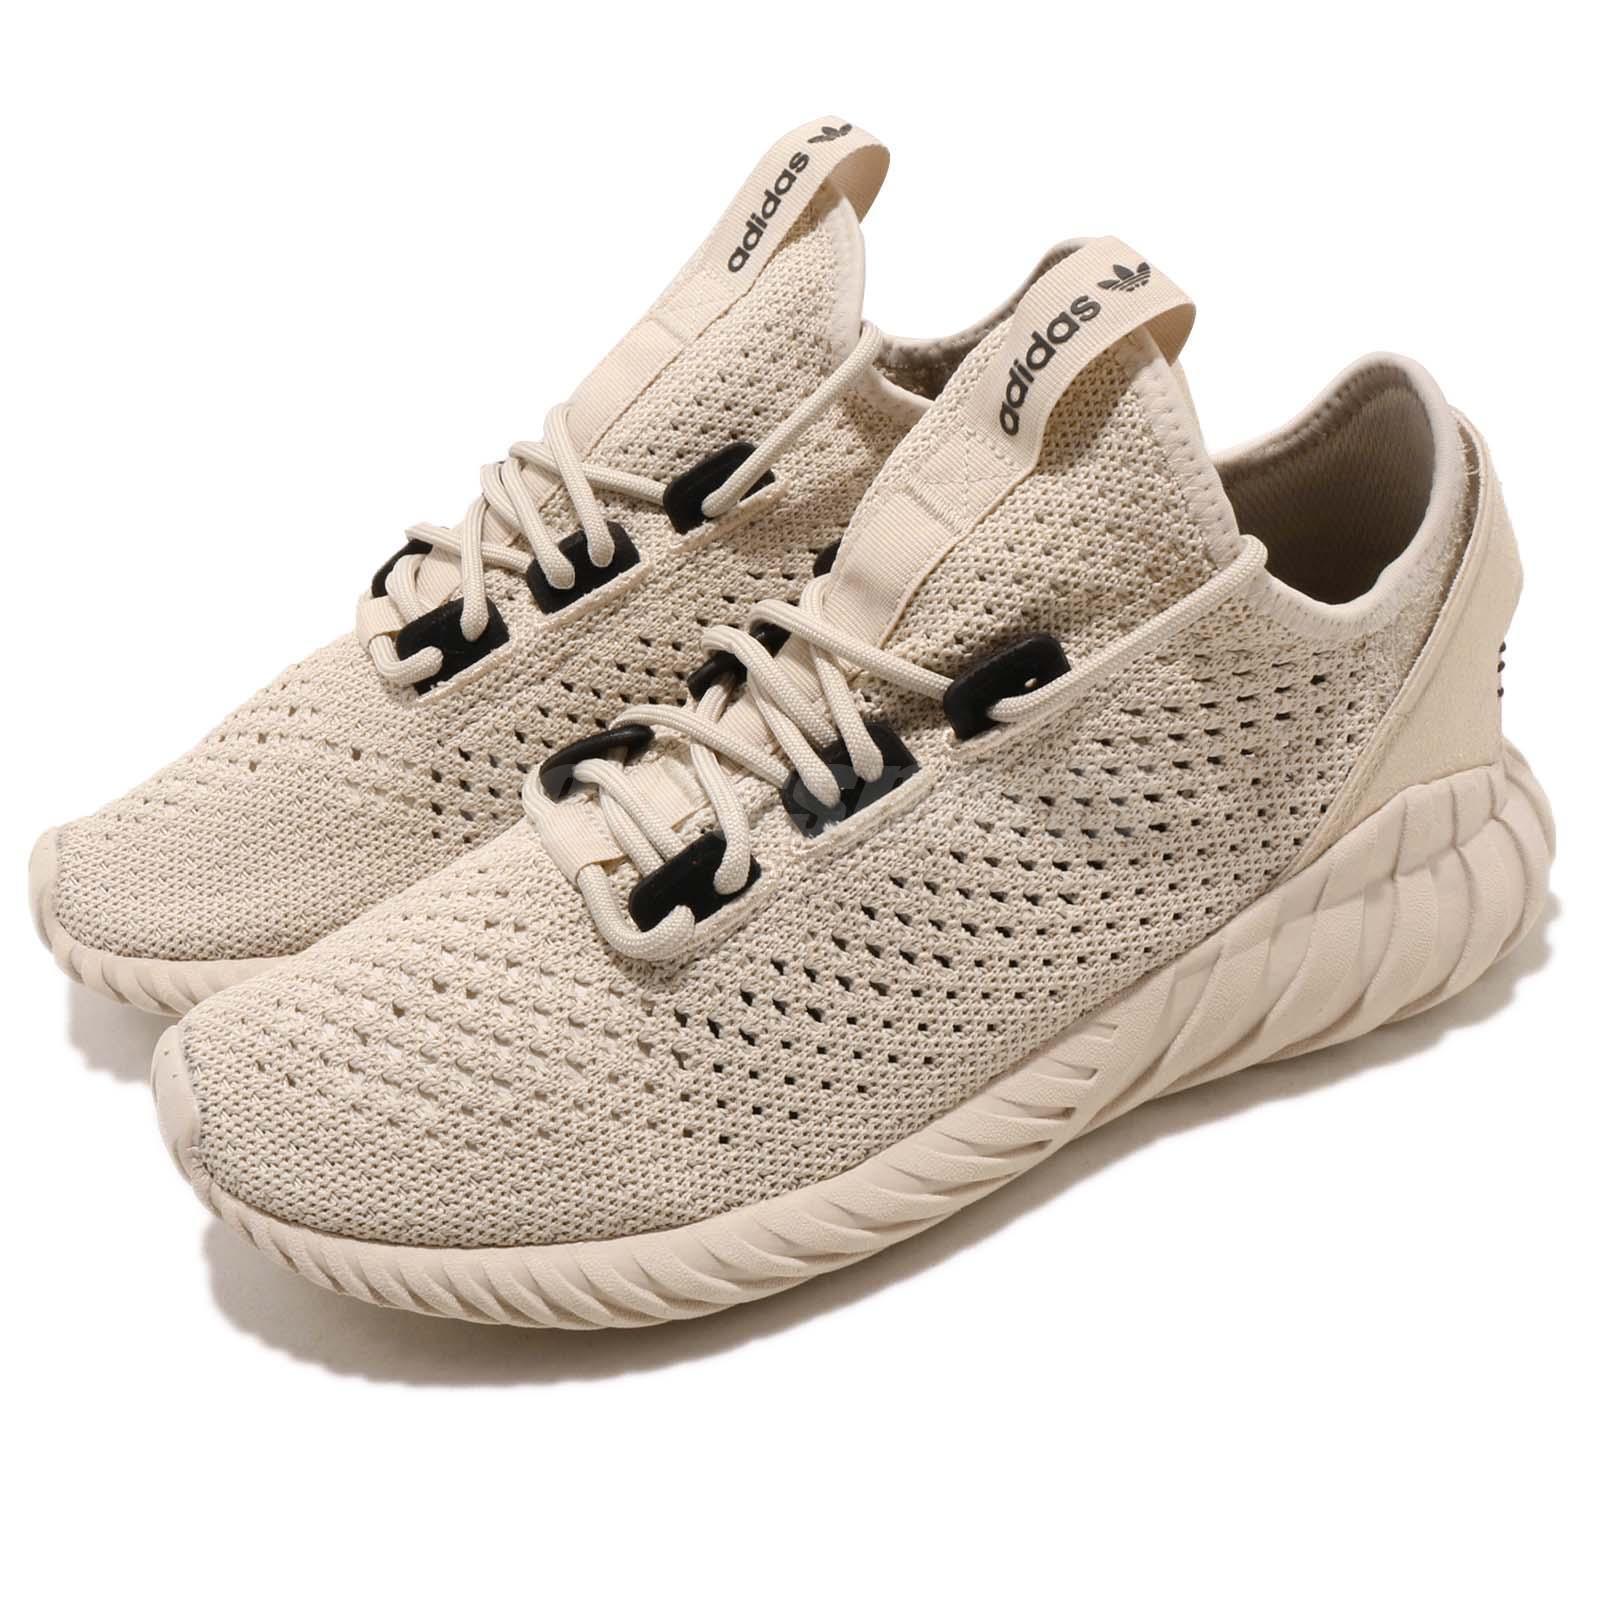 adidas Originals Tubular Doom Sock PK Primeknit homme Pick chaussures Baskets Pick homme 1 8f815d